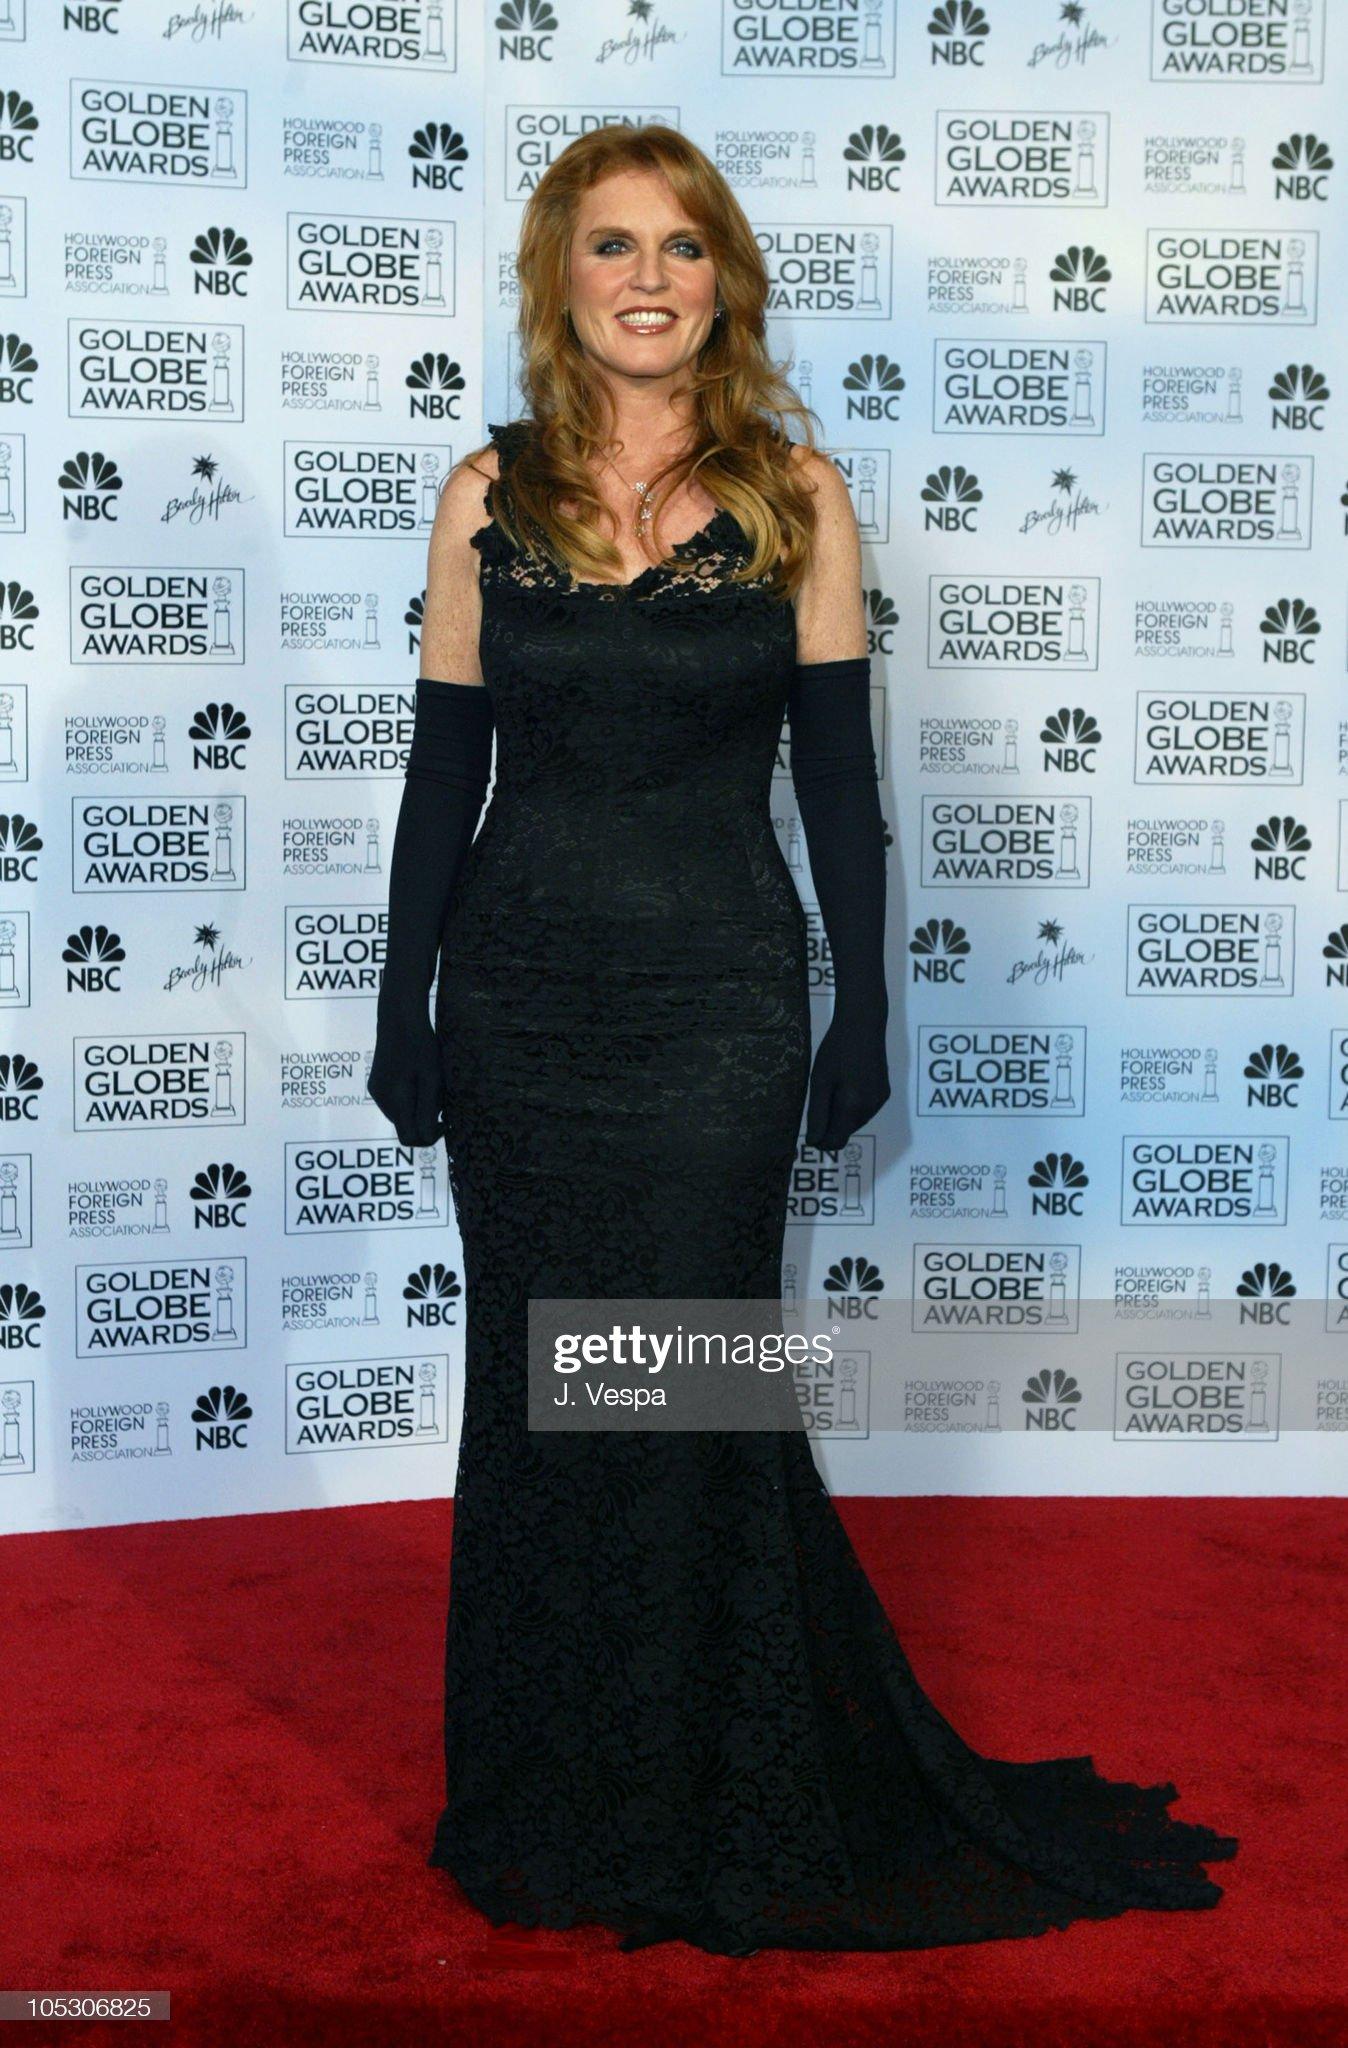 The 61st Annual Golden Globe Awards - Press Room : News Photo